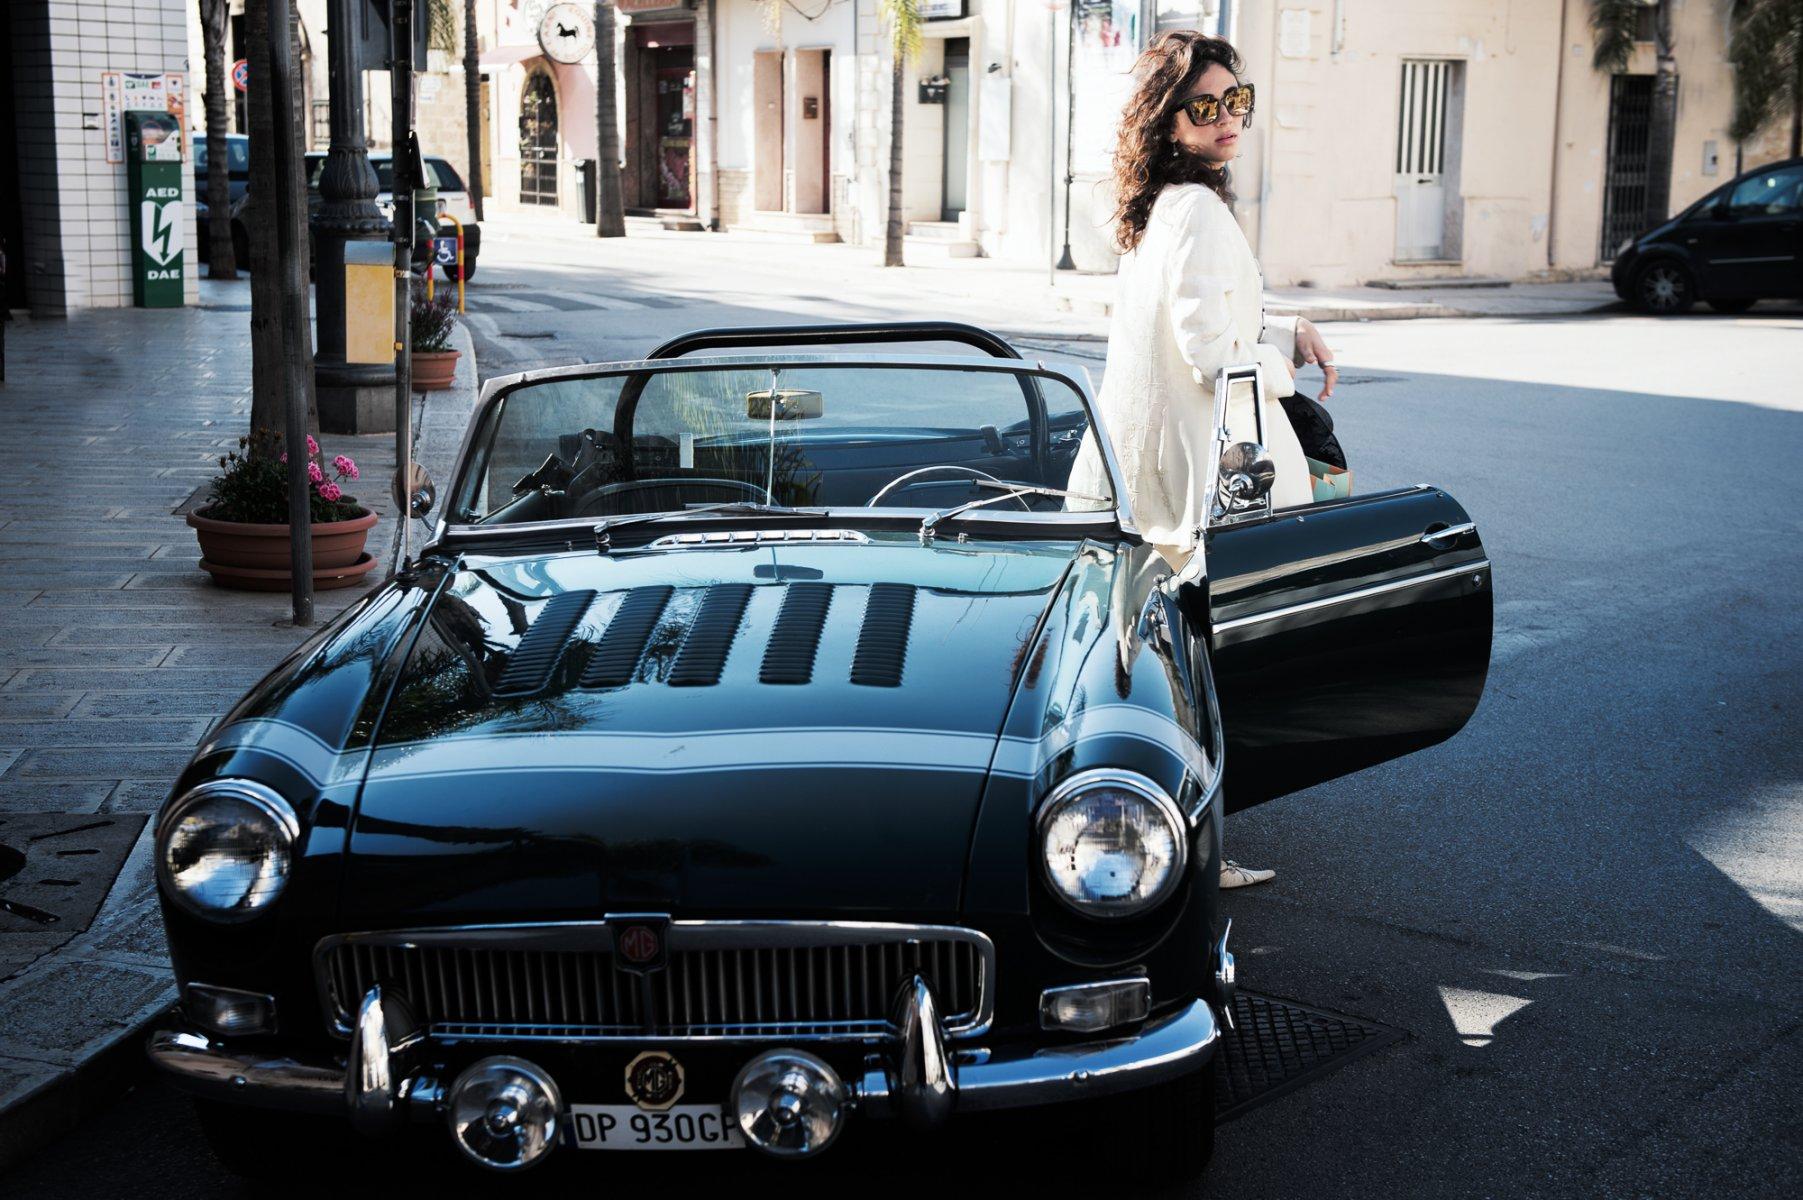 164-Pretty_Woman_MMD9381 Fashion/Adv